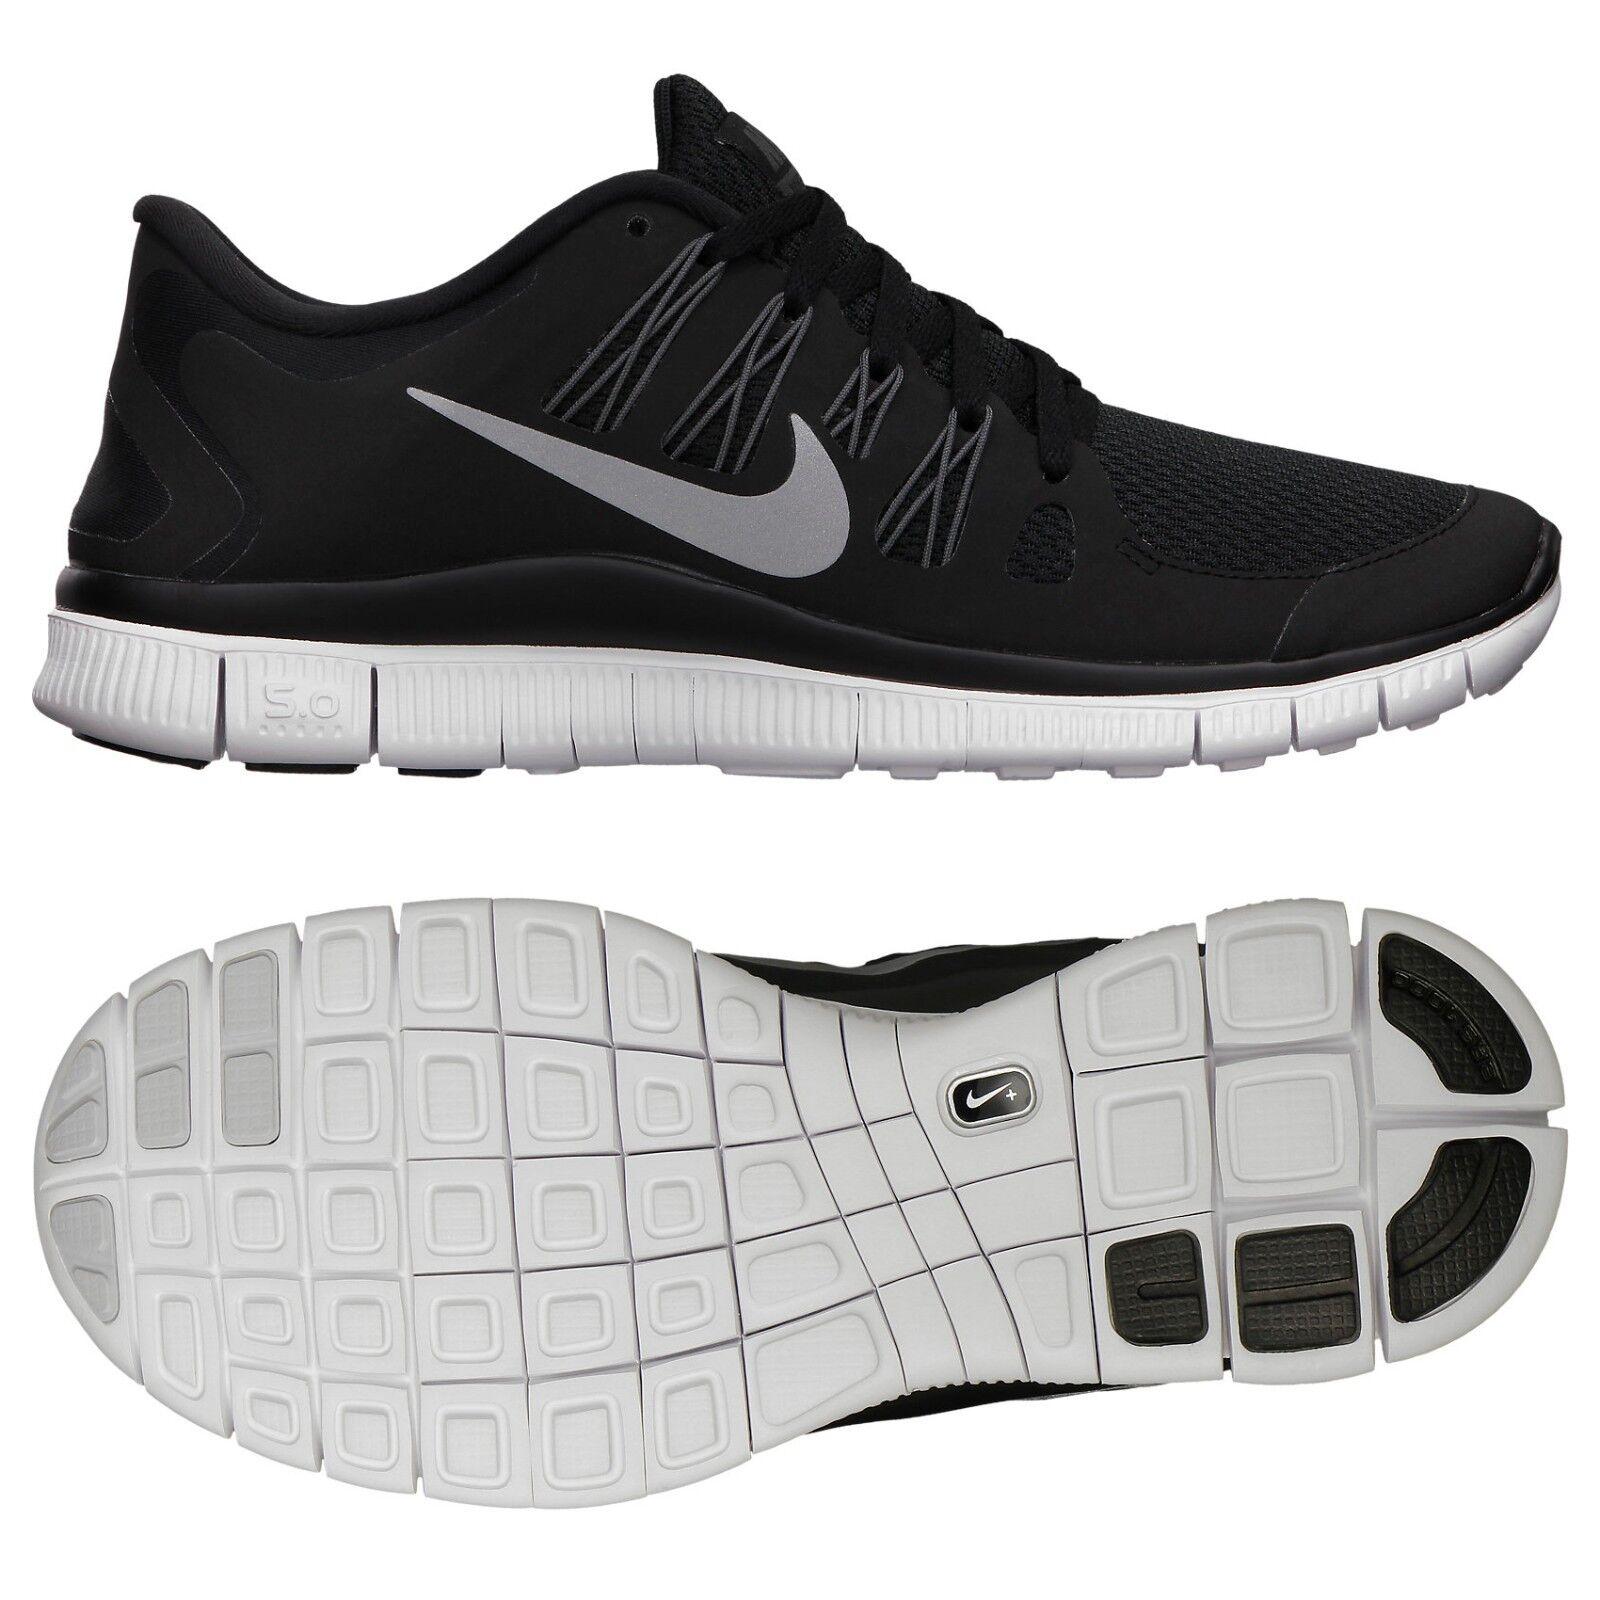 Nike Wmns Free 5.0+ 580591-002 Negro Plata gris gris gris Oscuro blancoo para Mujeres Zapatillas Para Correr  buena calidad